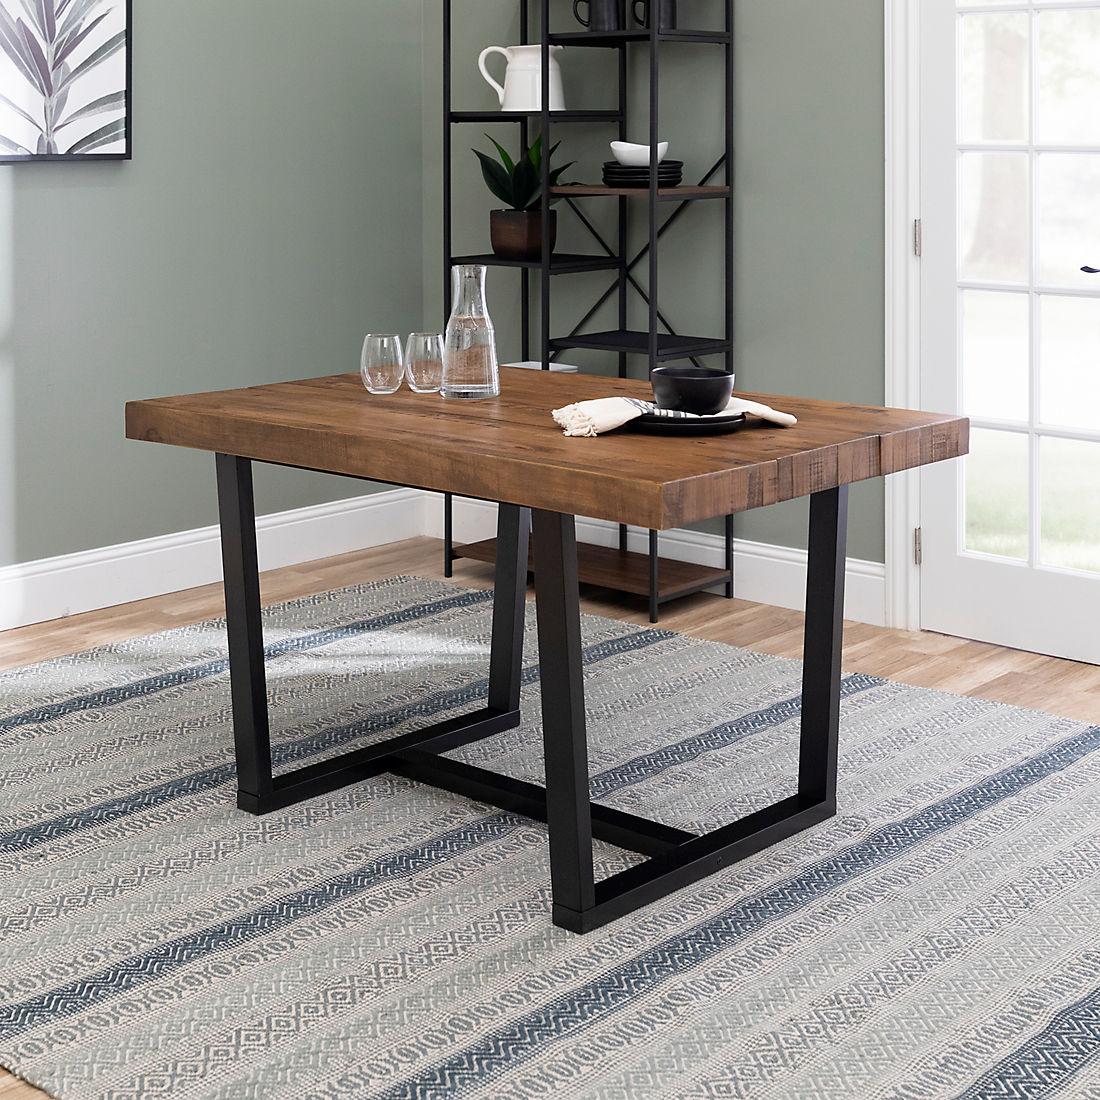 52 Distressed Solid Wood Dining Table Reclaimed Barnwood Bjs Wholesale Club